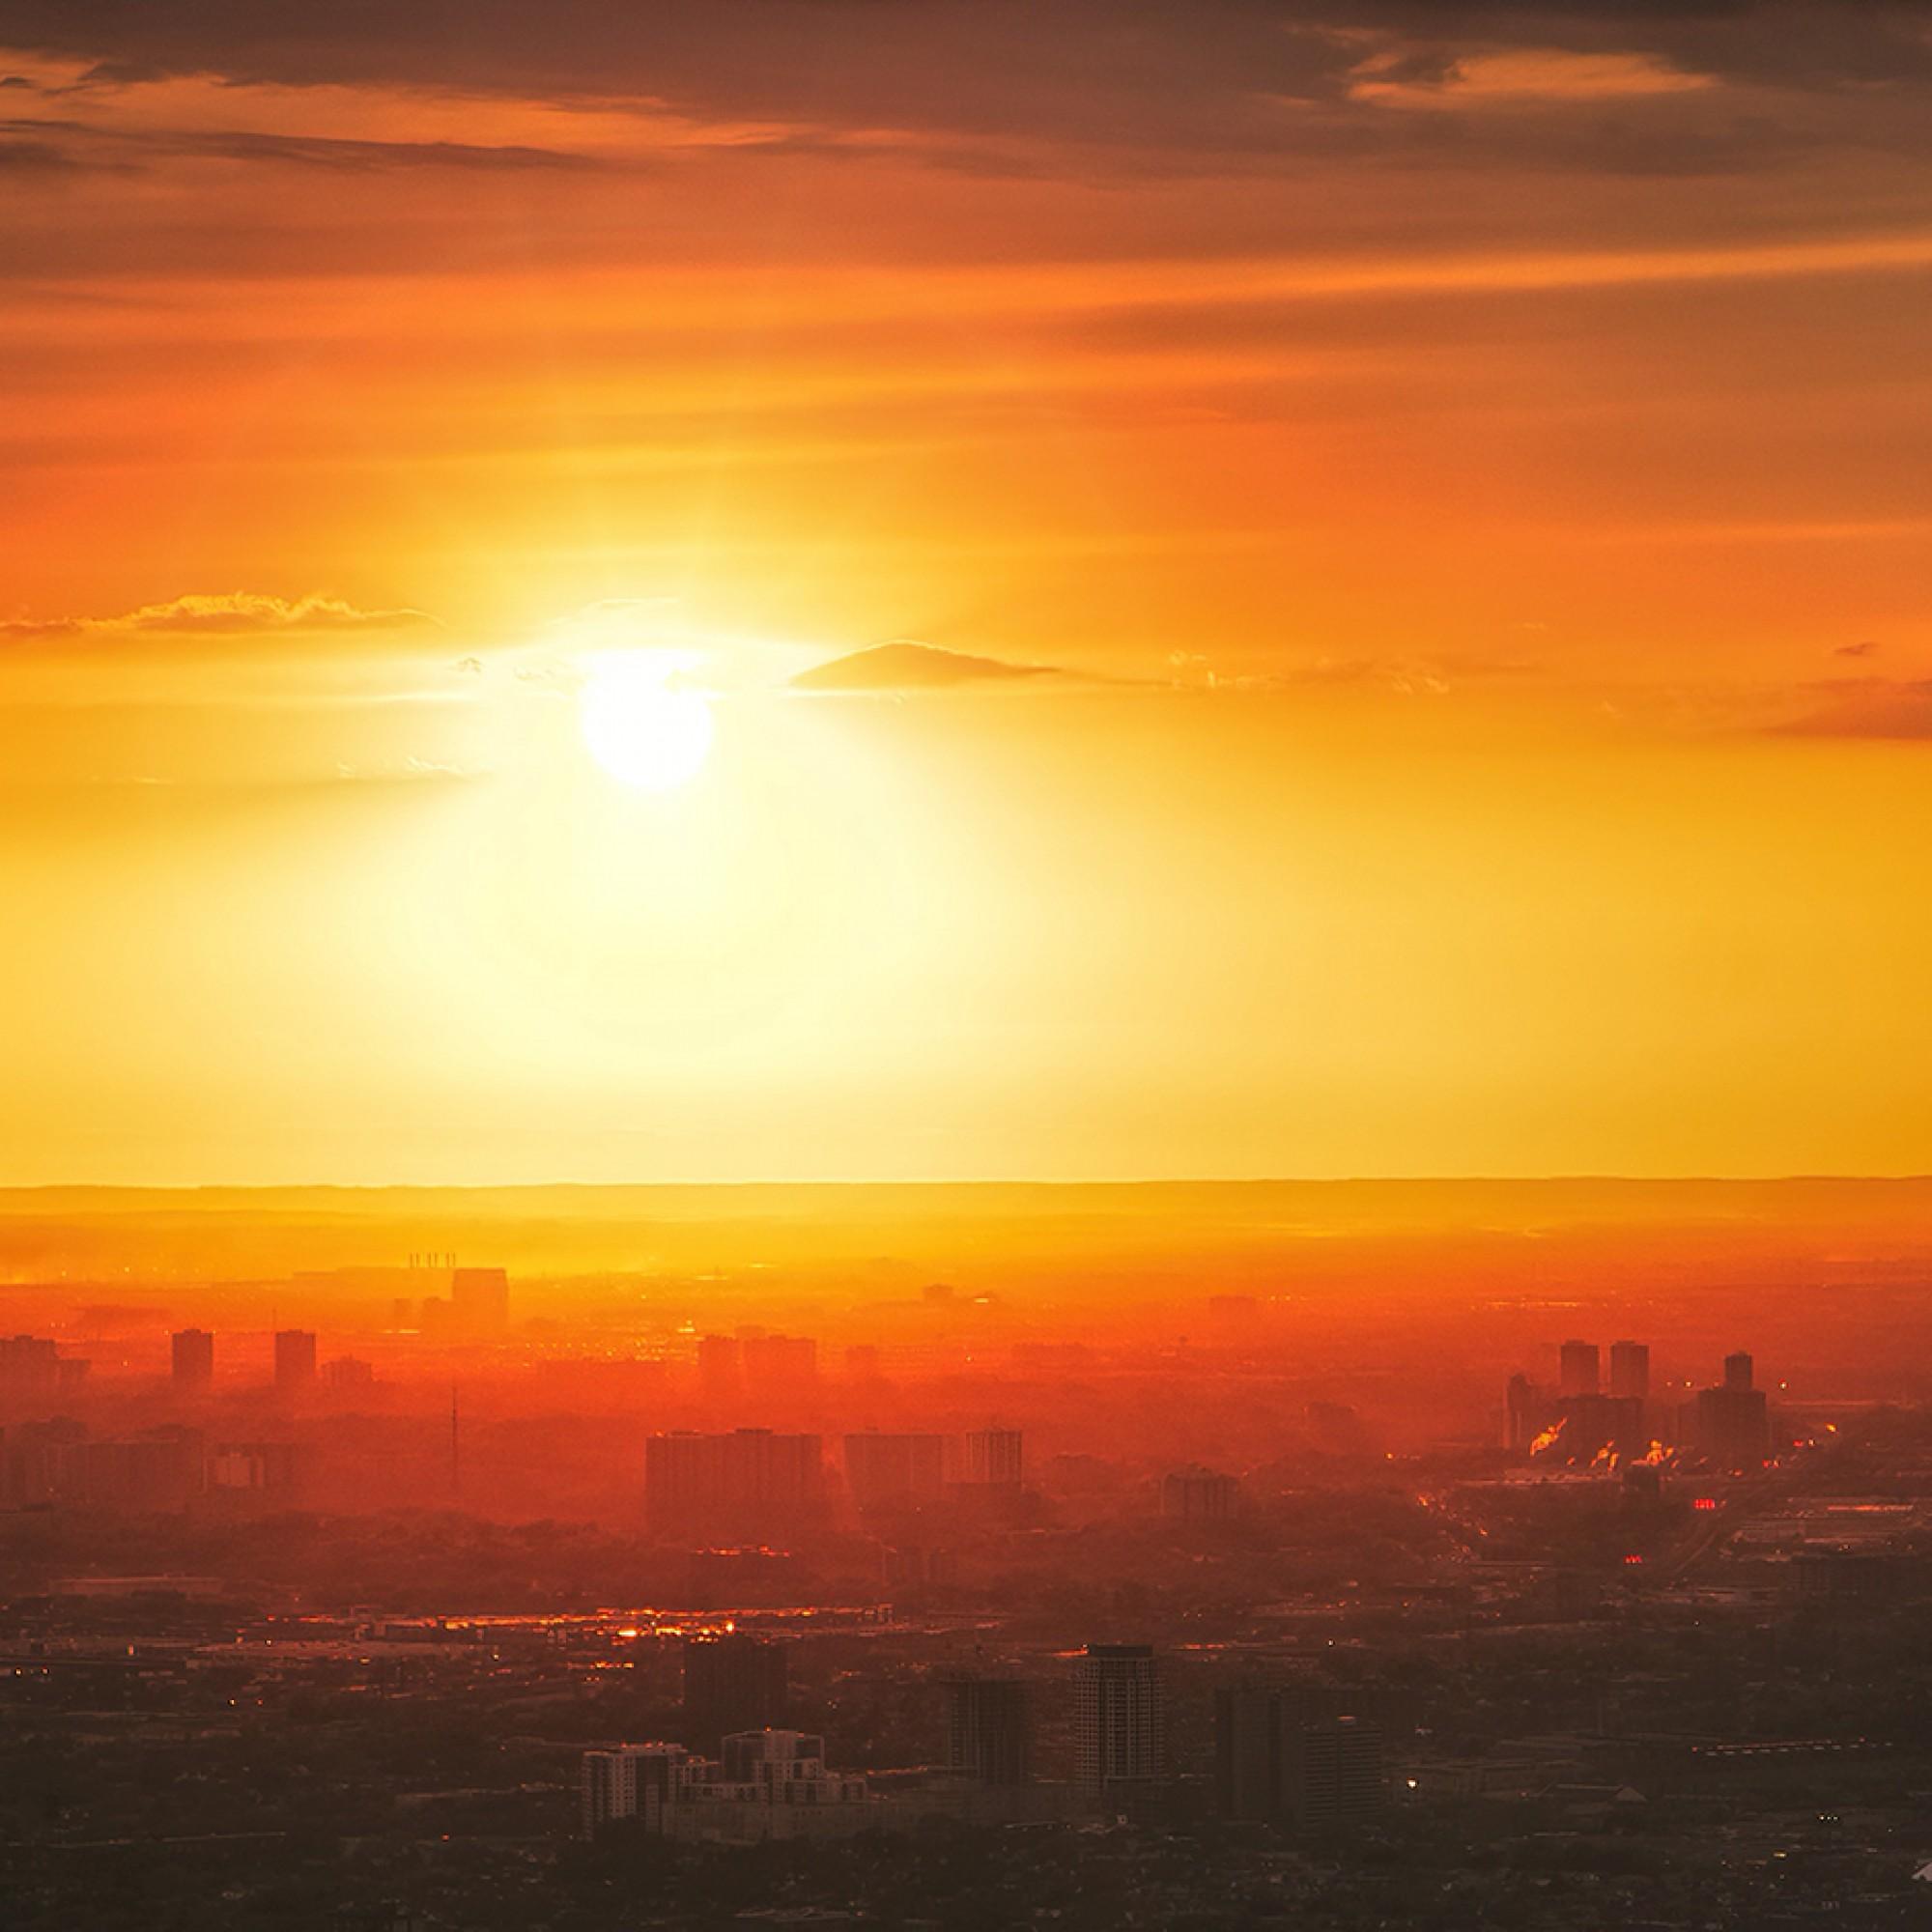 Sonnenuntergang, Symbolbild.